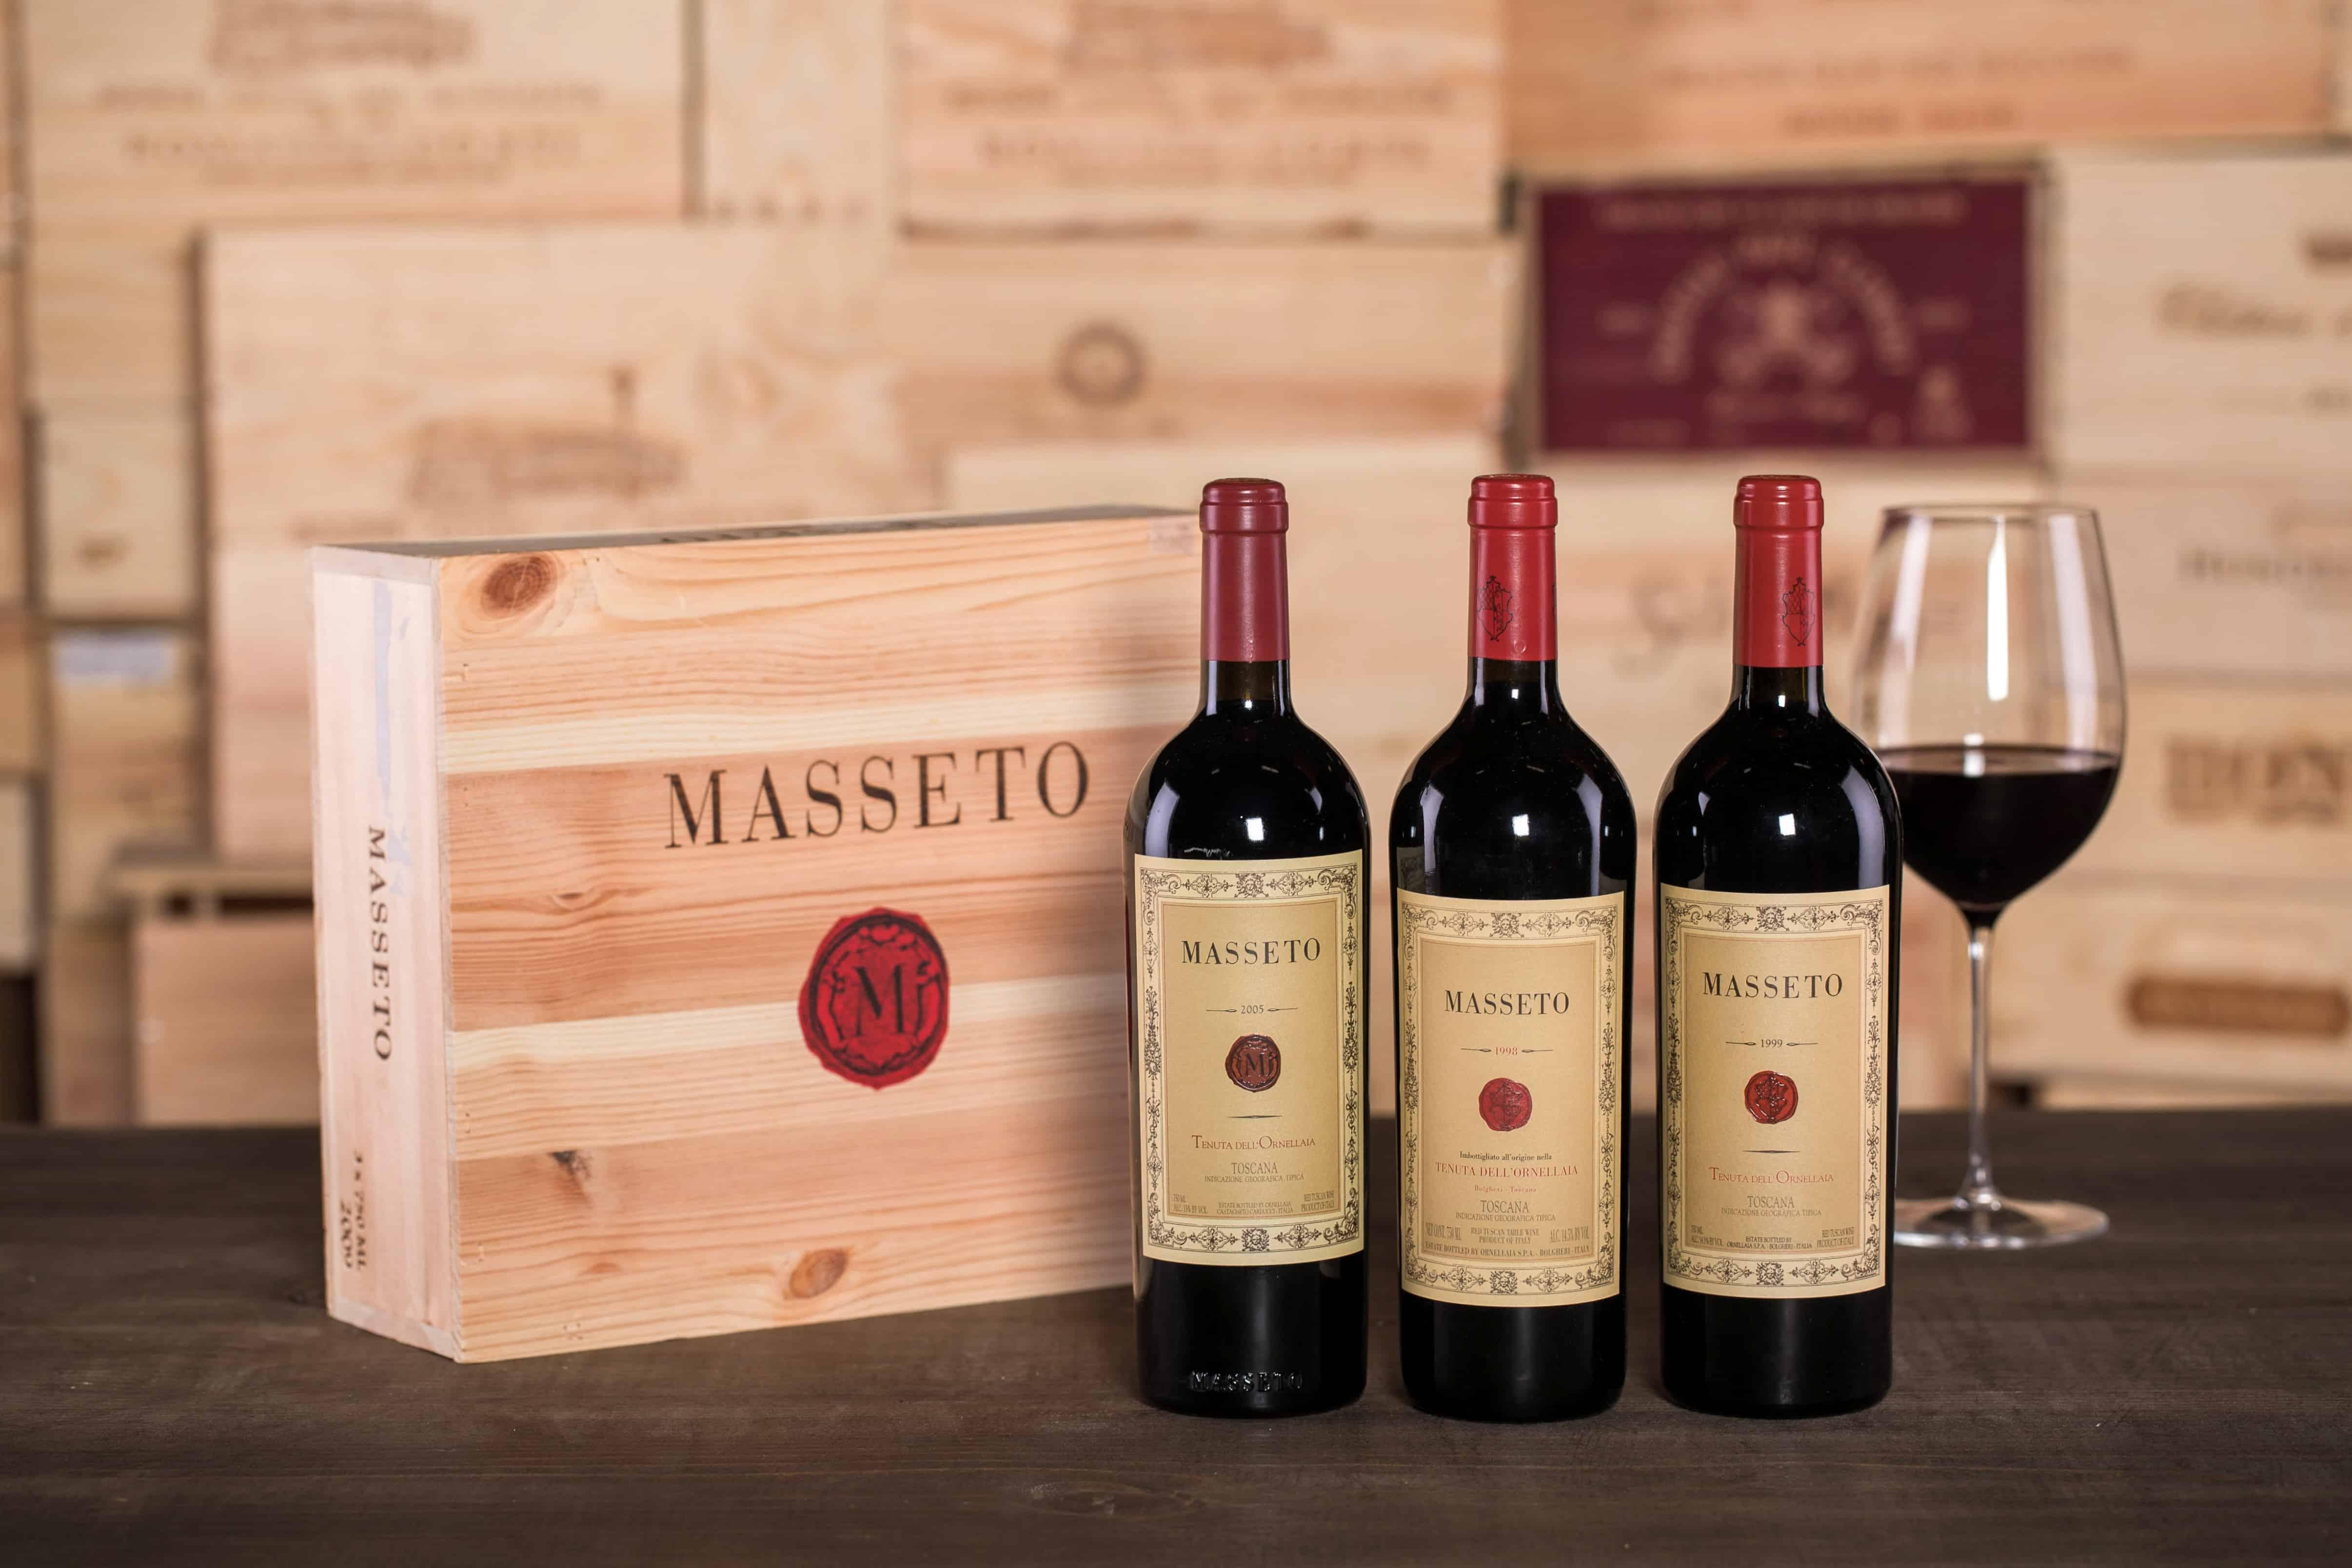 Masseto makes some of the Super Tuscan best vintages